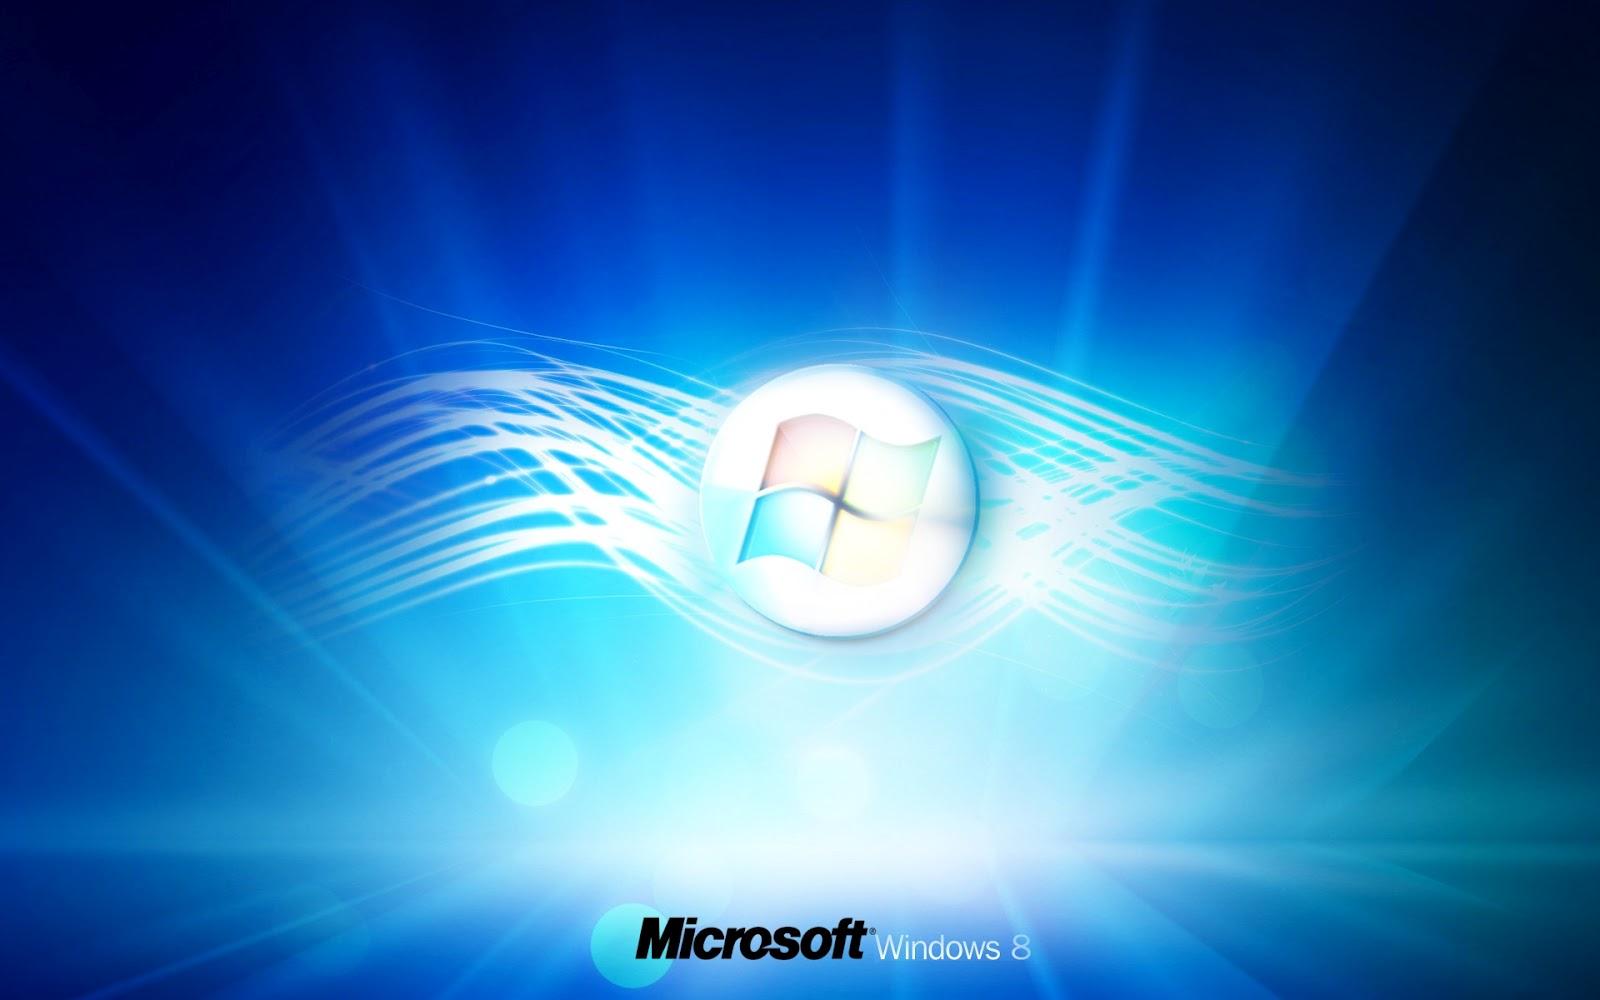 Download Wallpapers Windows 8 Baru [HD] Part 10   Tutorial Blog 1600x1000